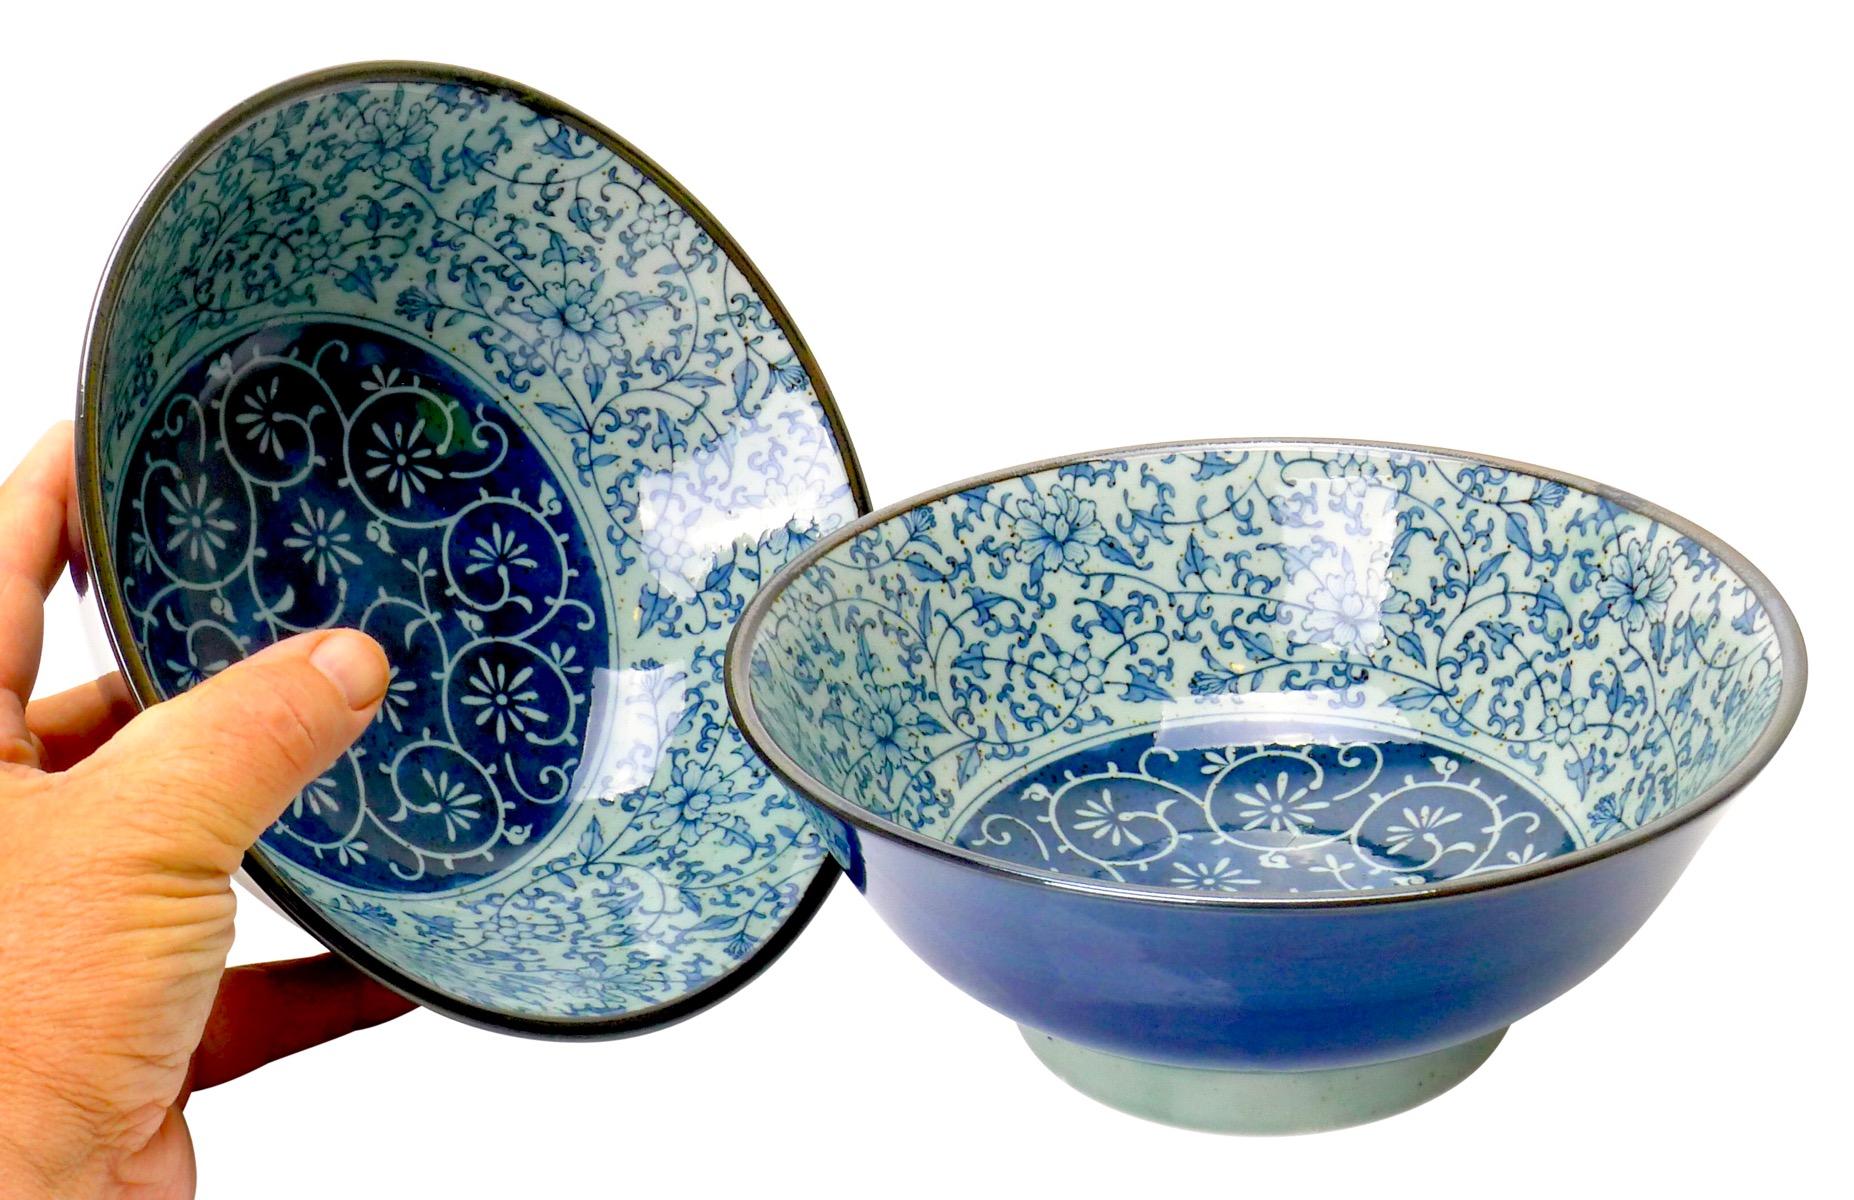 Image of Japanese Porcelain Bowl 8.5-Inch, Dark and Light Blue Ivy